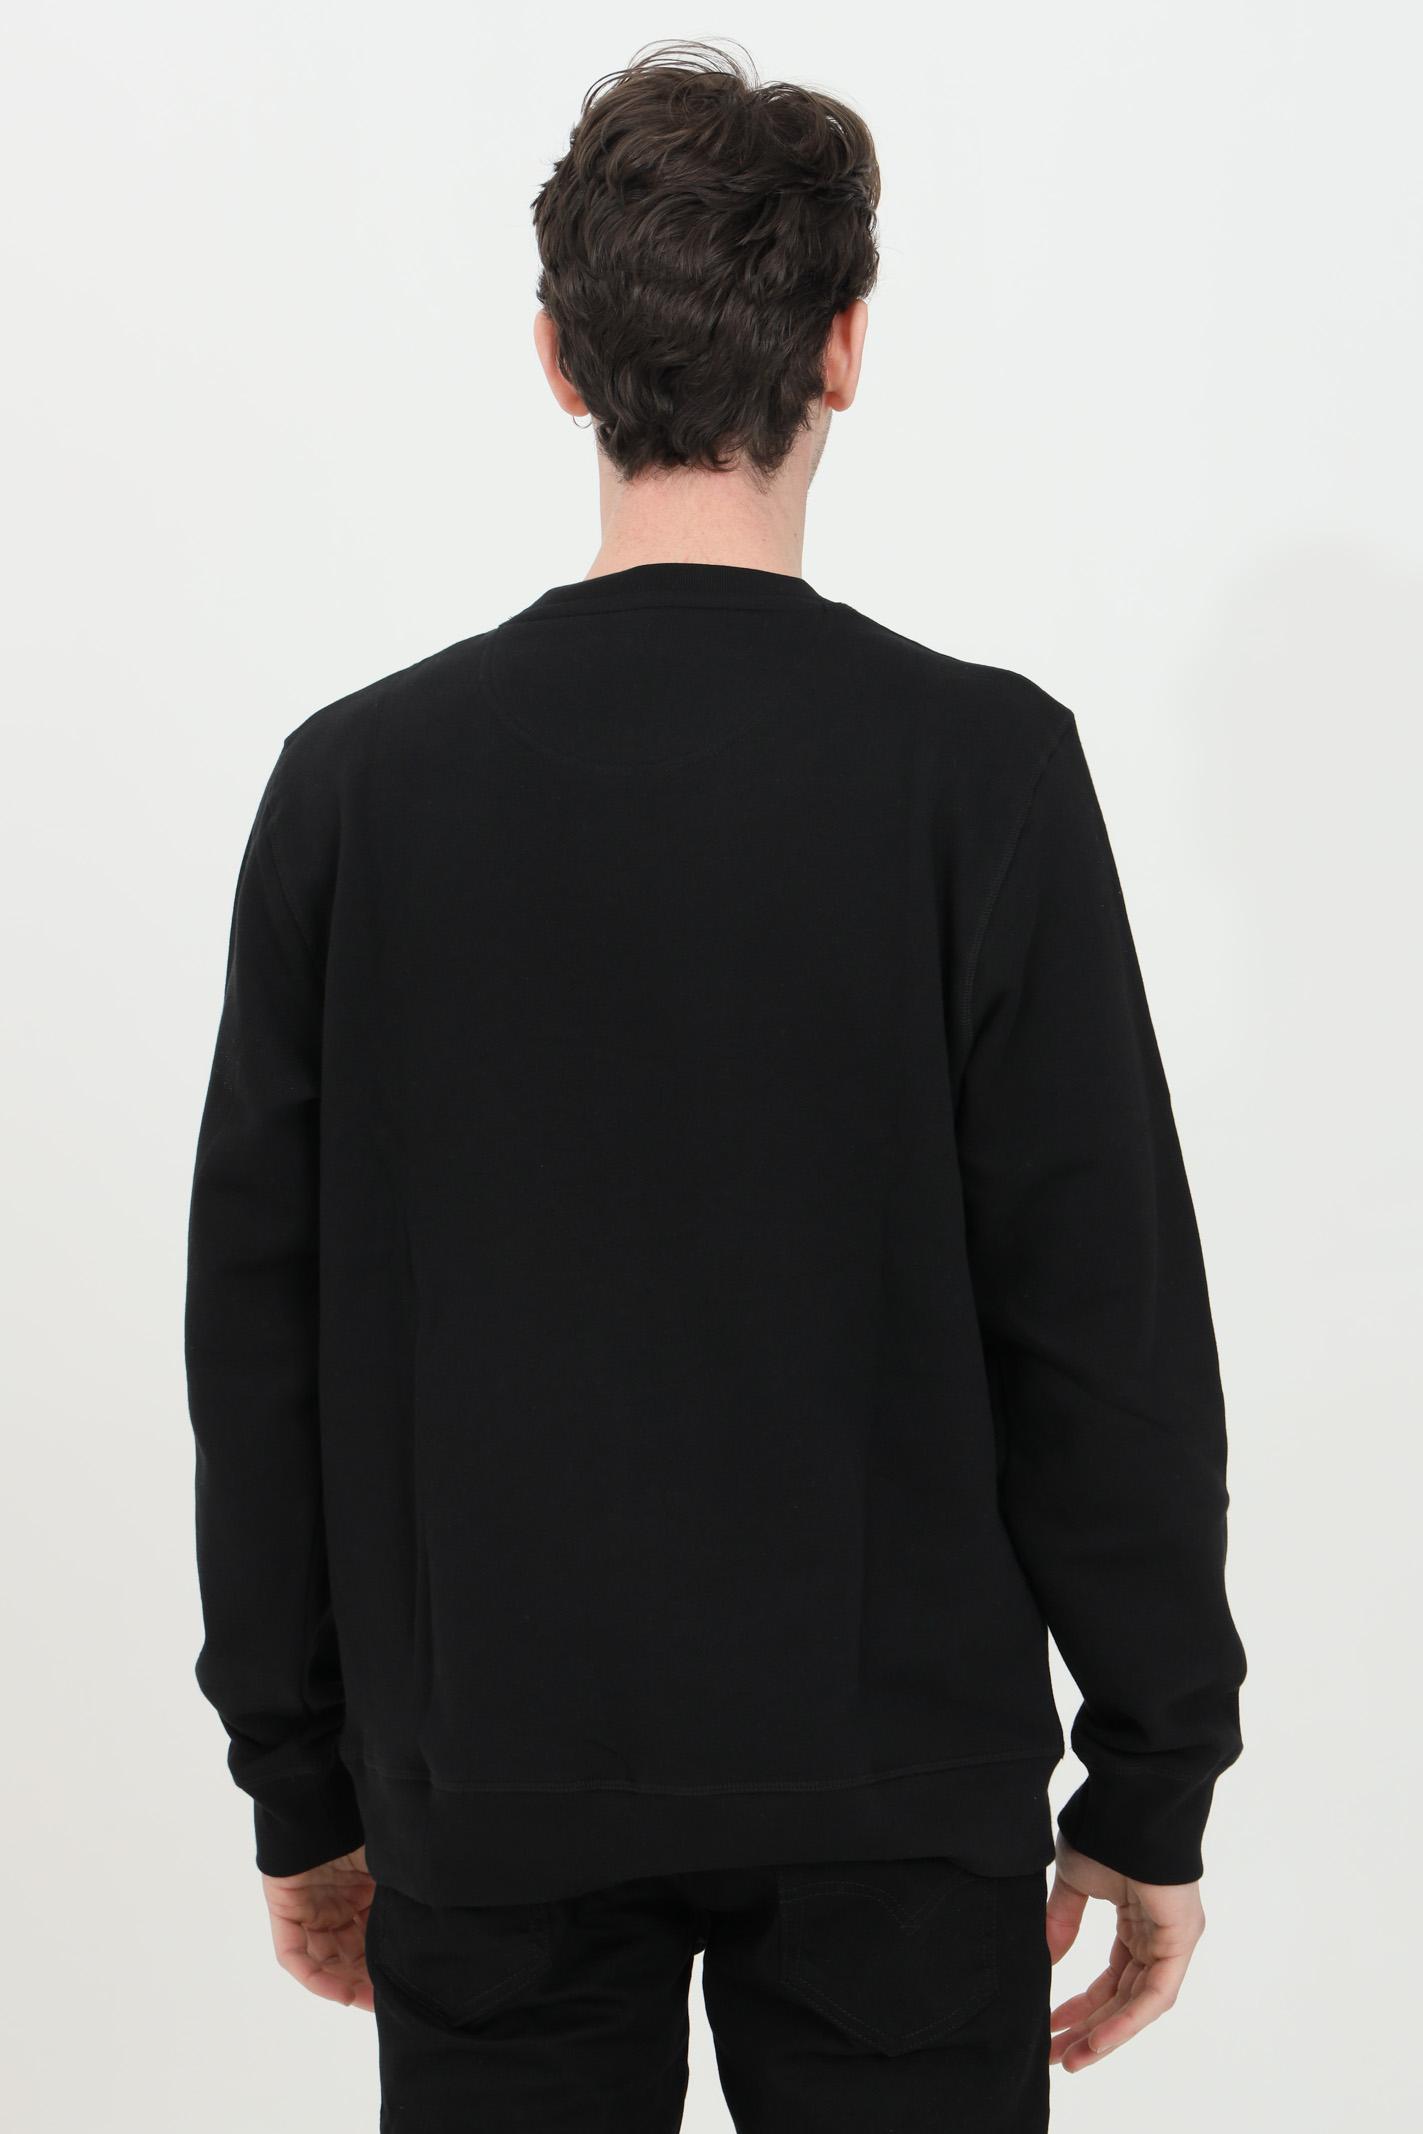 Black crew neck sweatshirt with international logo print on the front. Barbour BARbour | Sweatshirt | MOL0156-MOLBK31